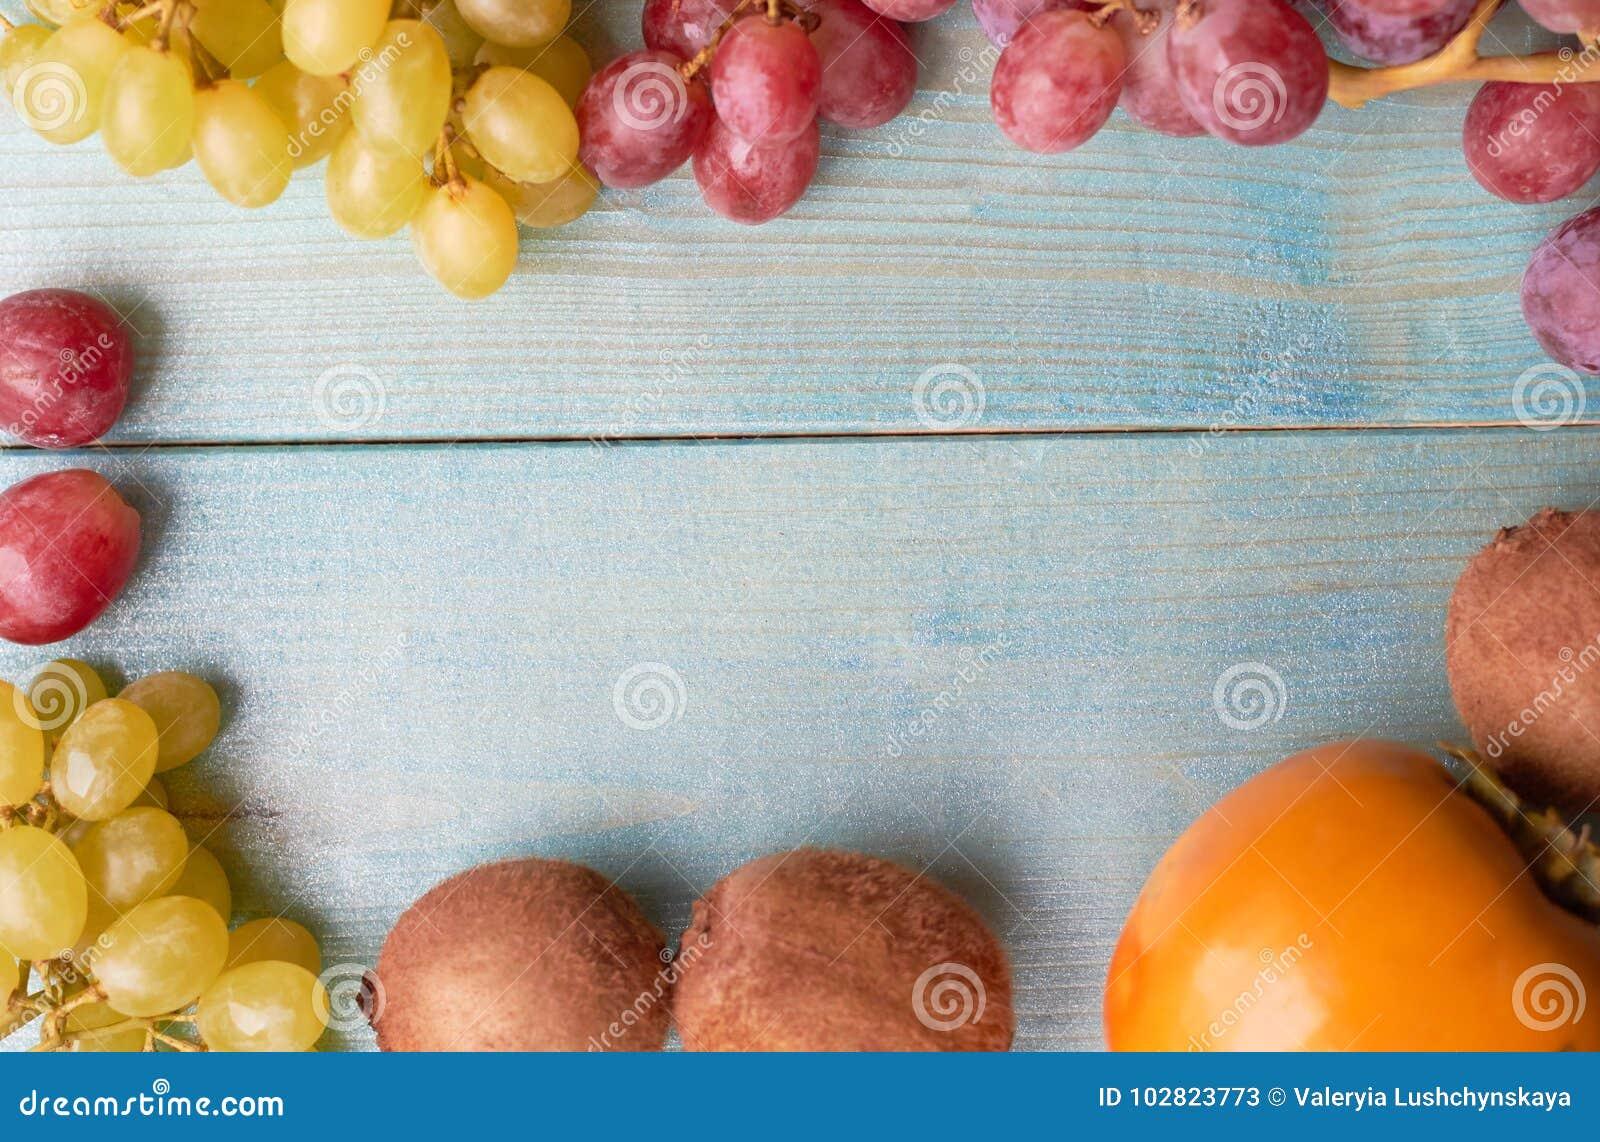 Fondo de frutas jugosas